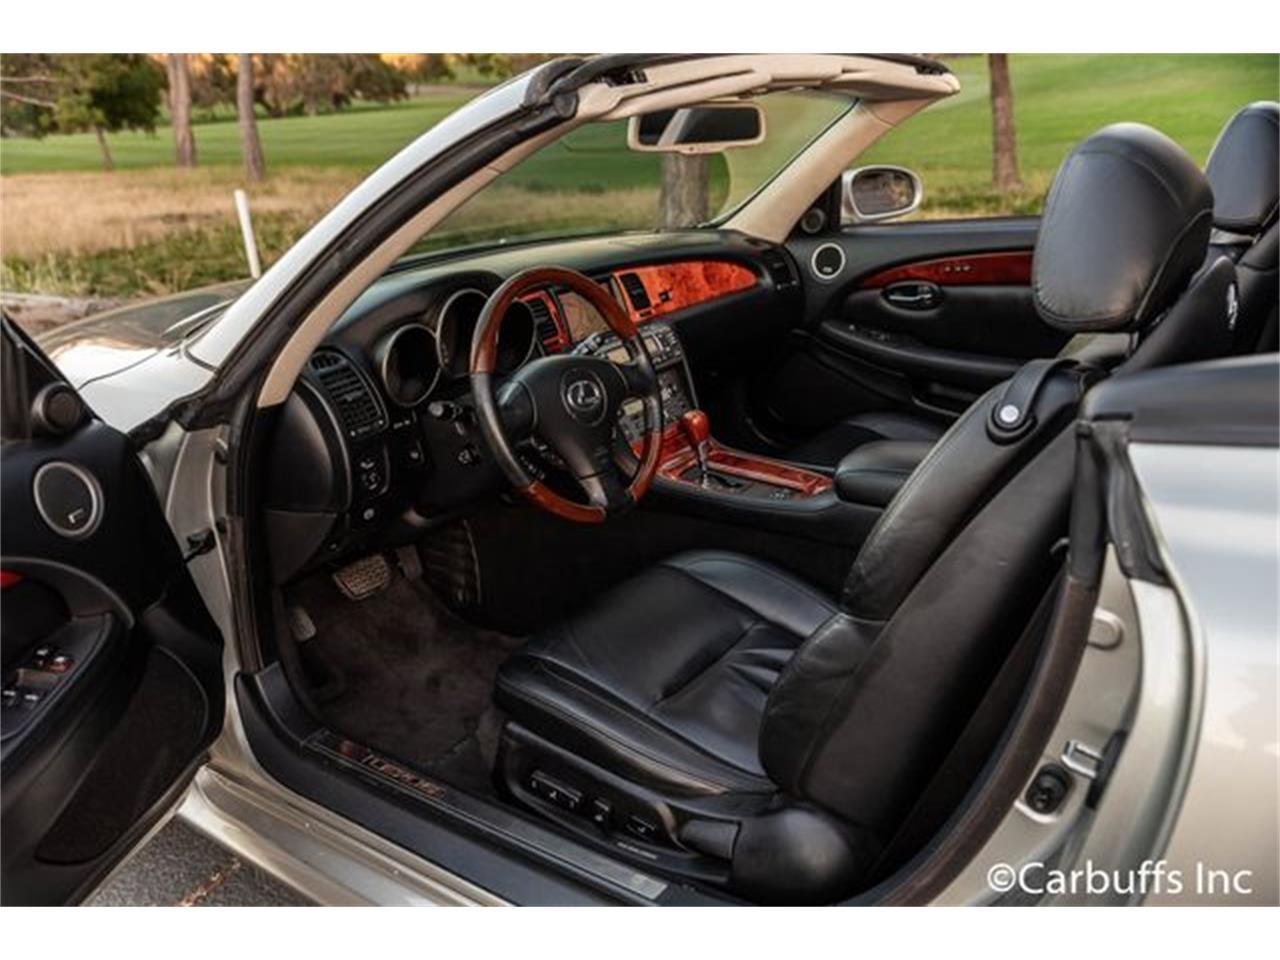 2004 Lexus SC400 (CC-1239509) for sale in Concord, California